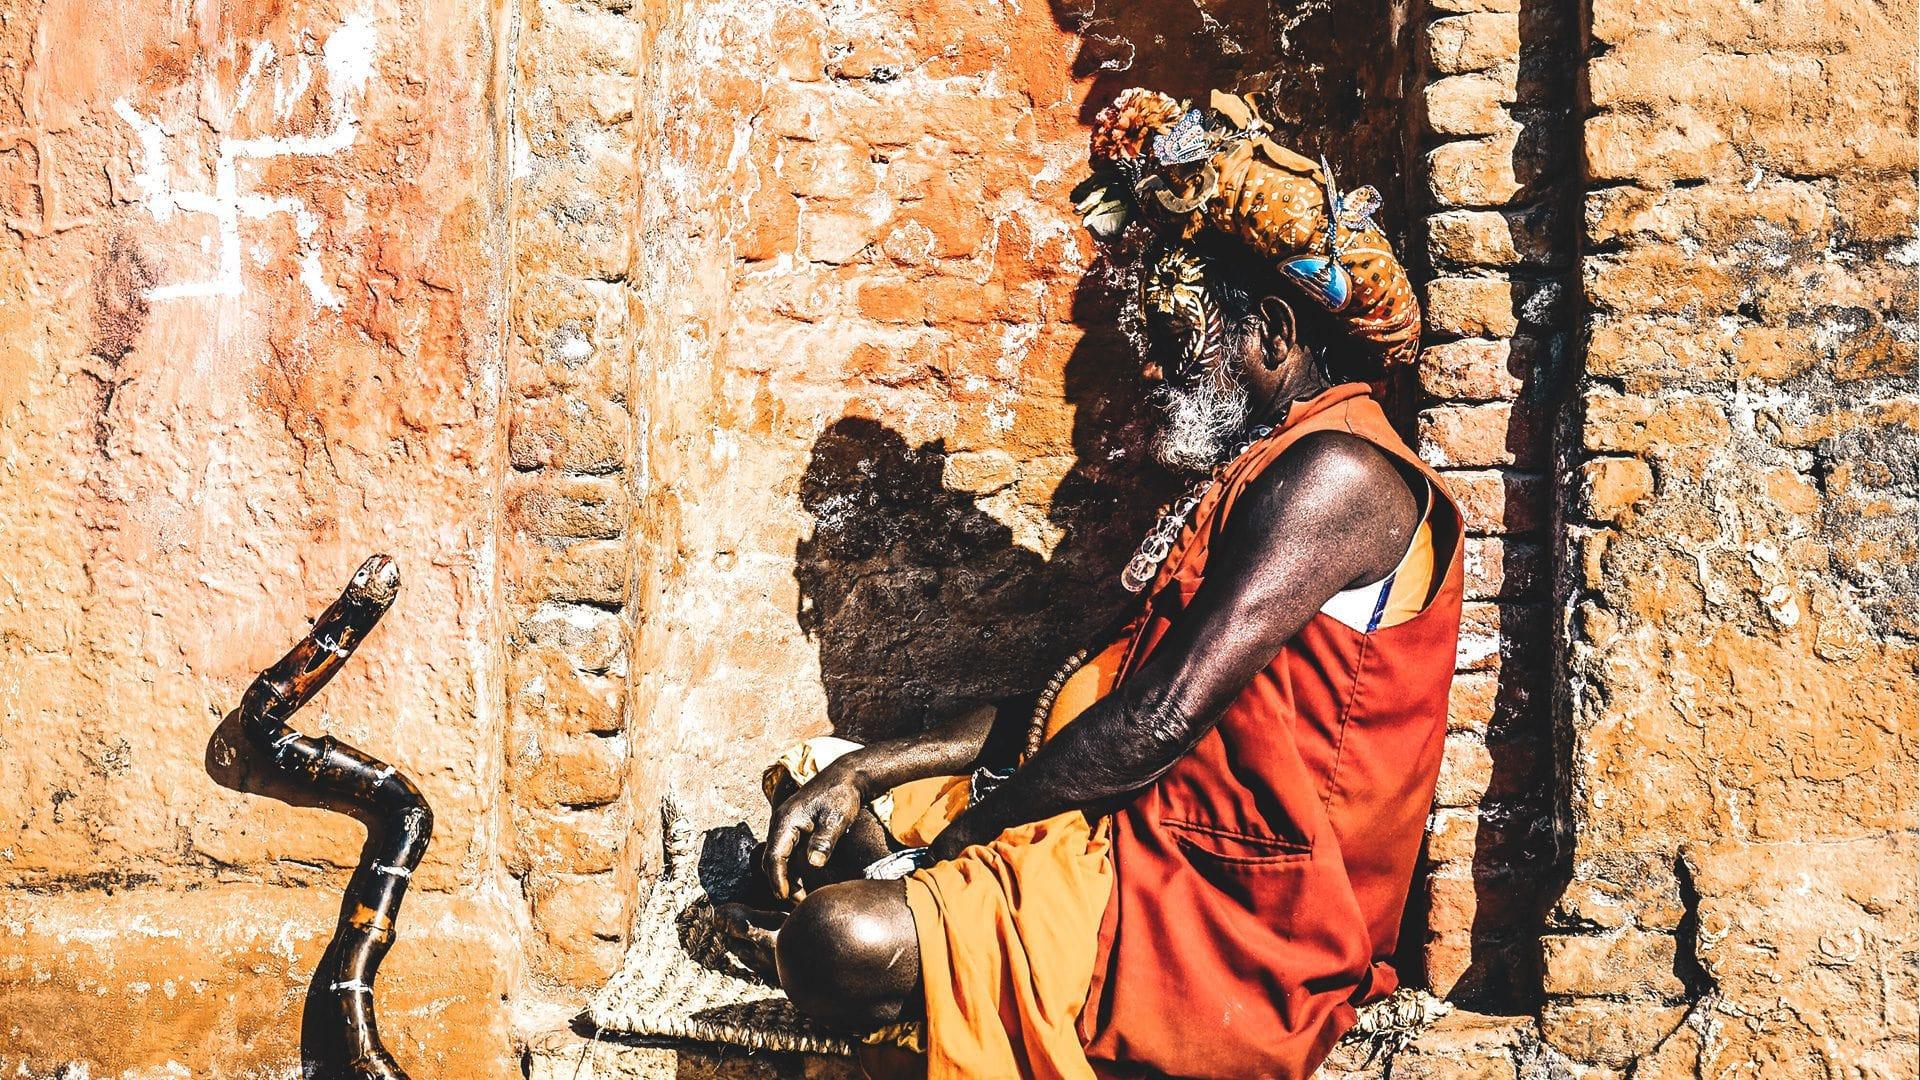 Sensaciones India | Rojo Cangrejo Blog de Viajes